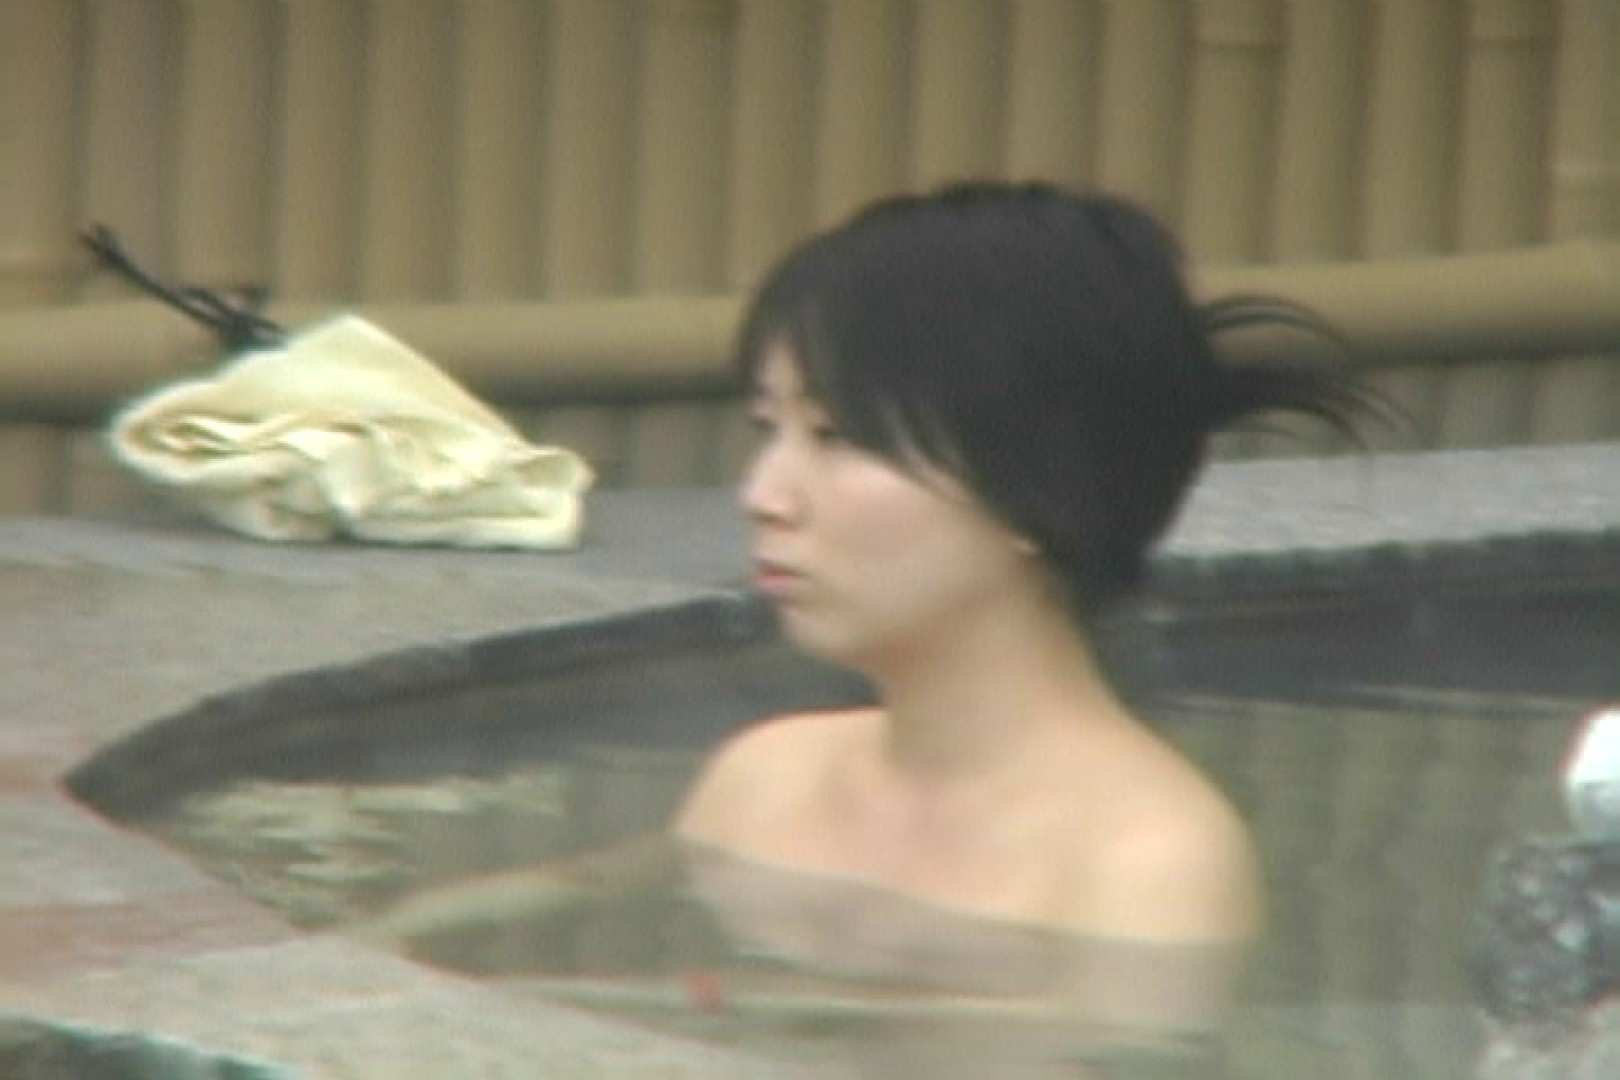 Aquaな露天風呂Vol.567 0 | 0  105連発 59